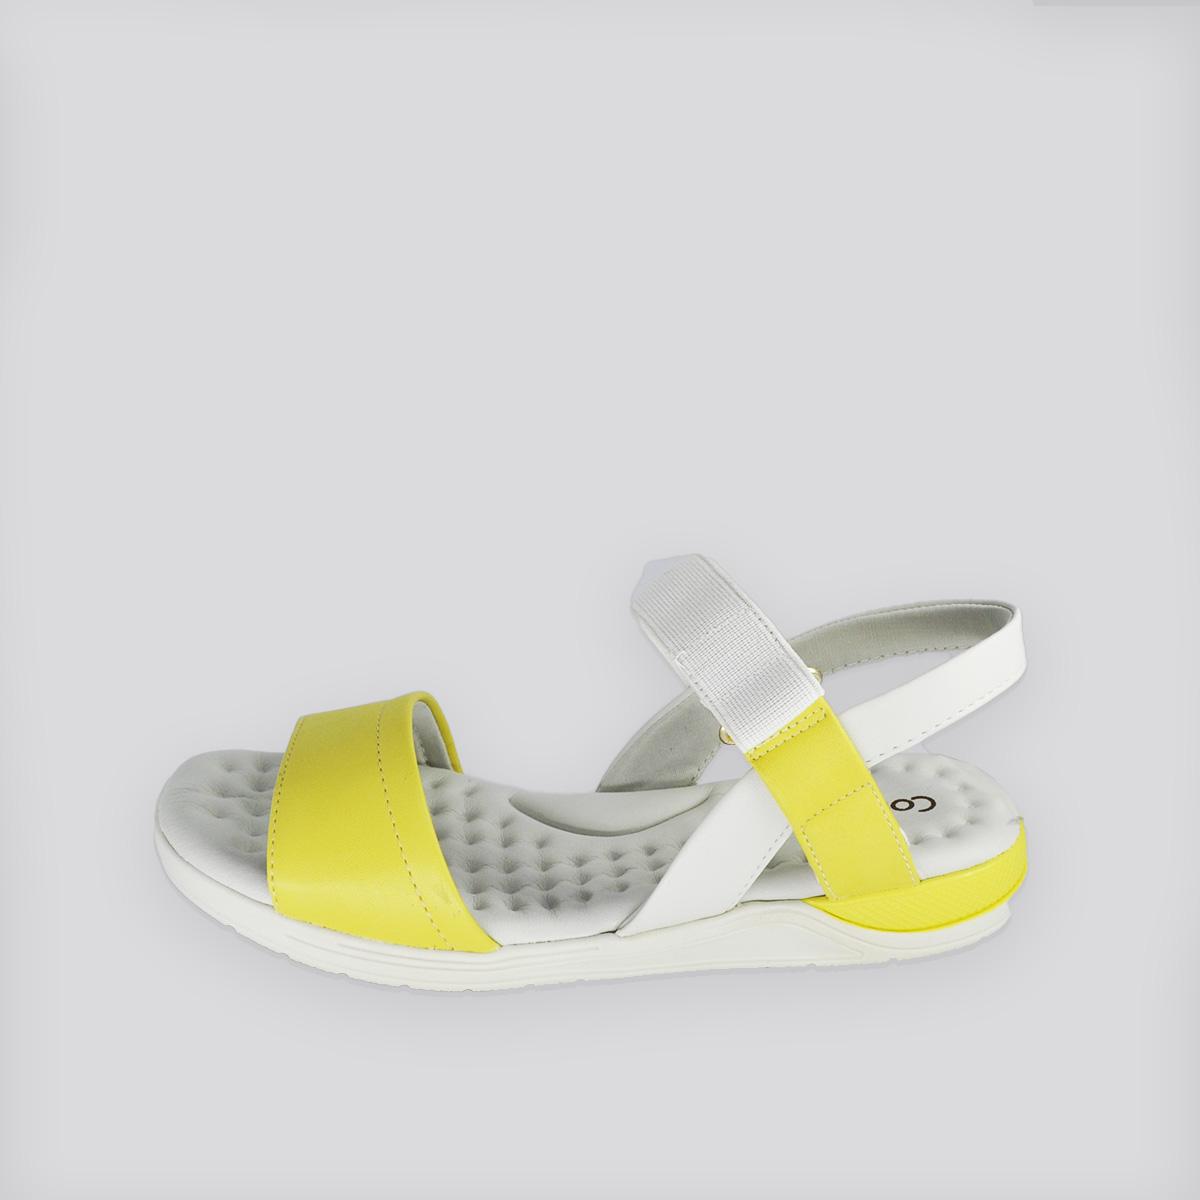 Papete ConfortFlex Branco/Amarelo Napa